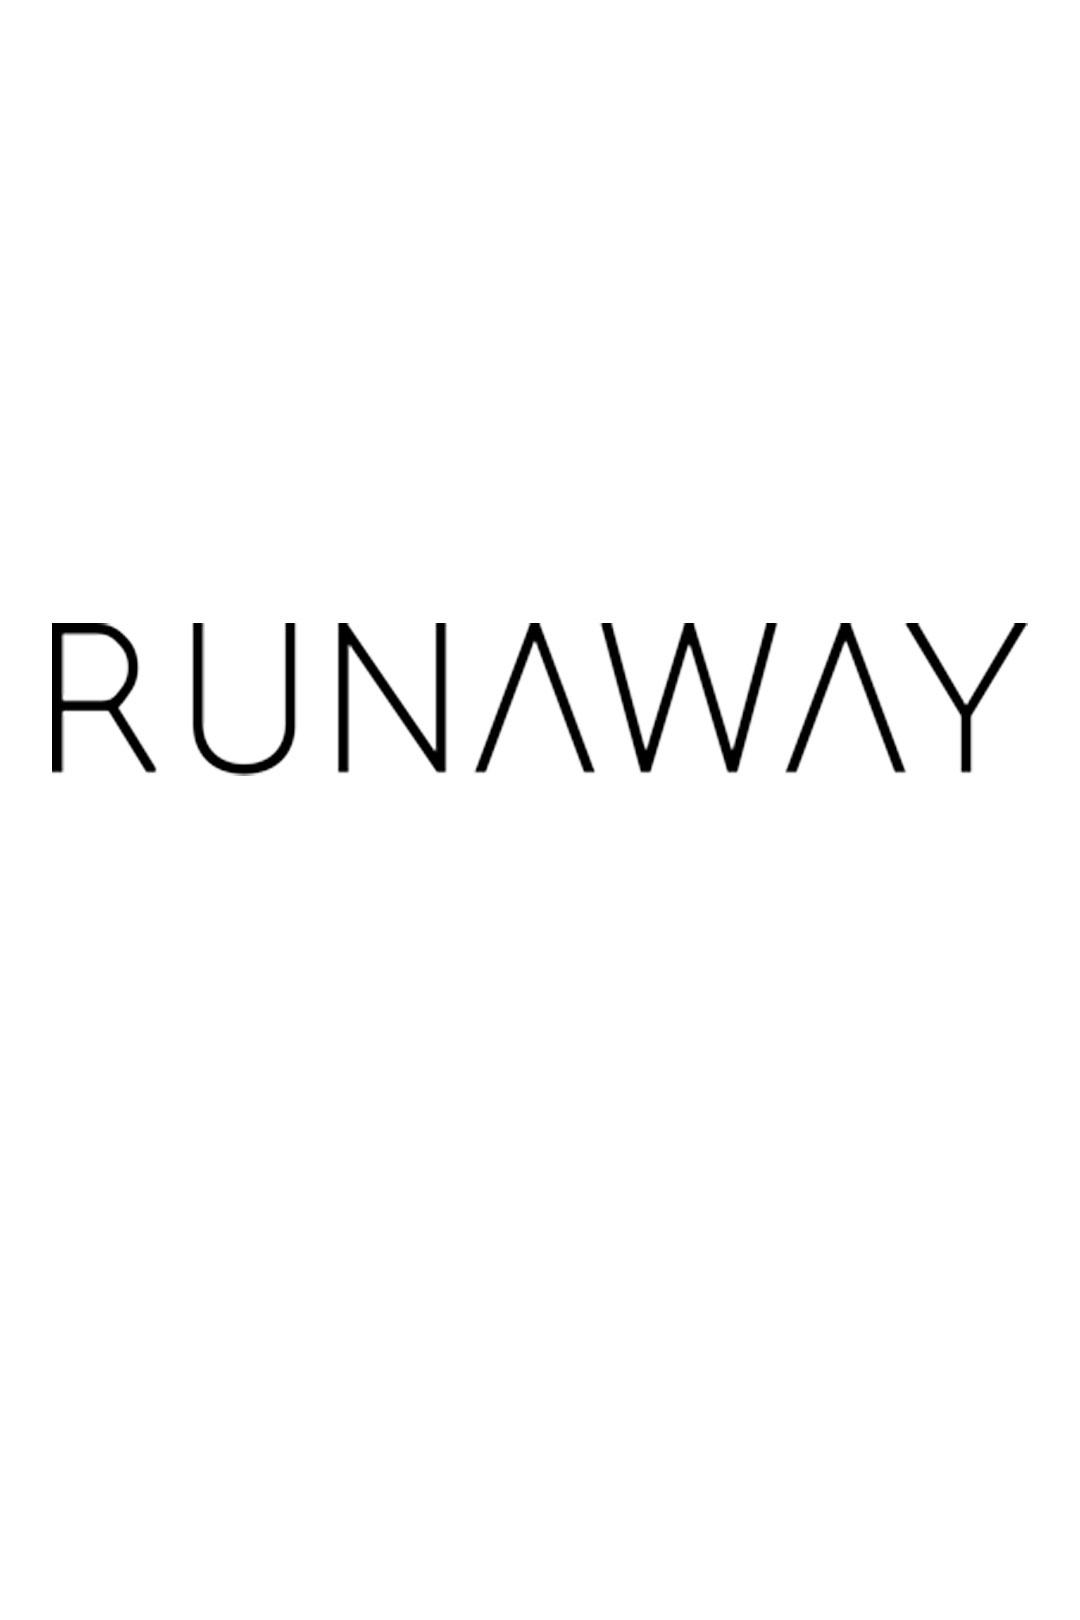 Runaway the Label